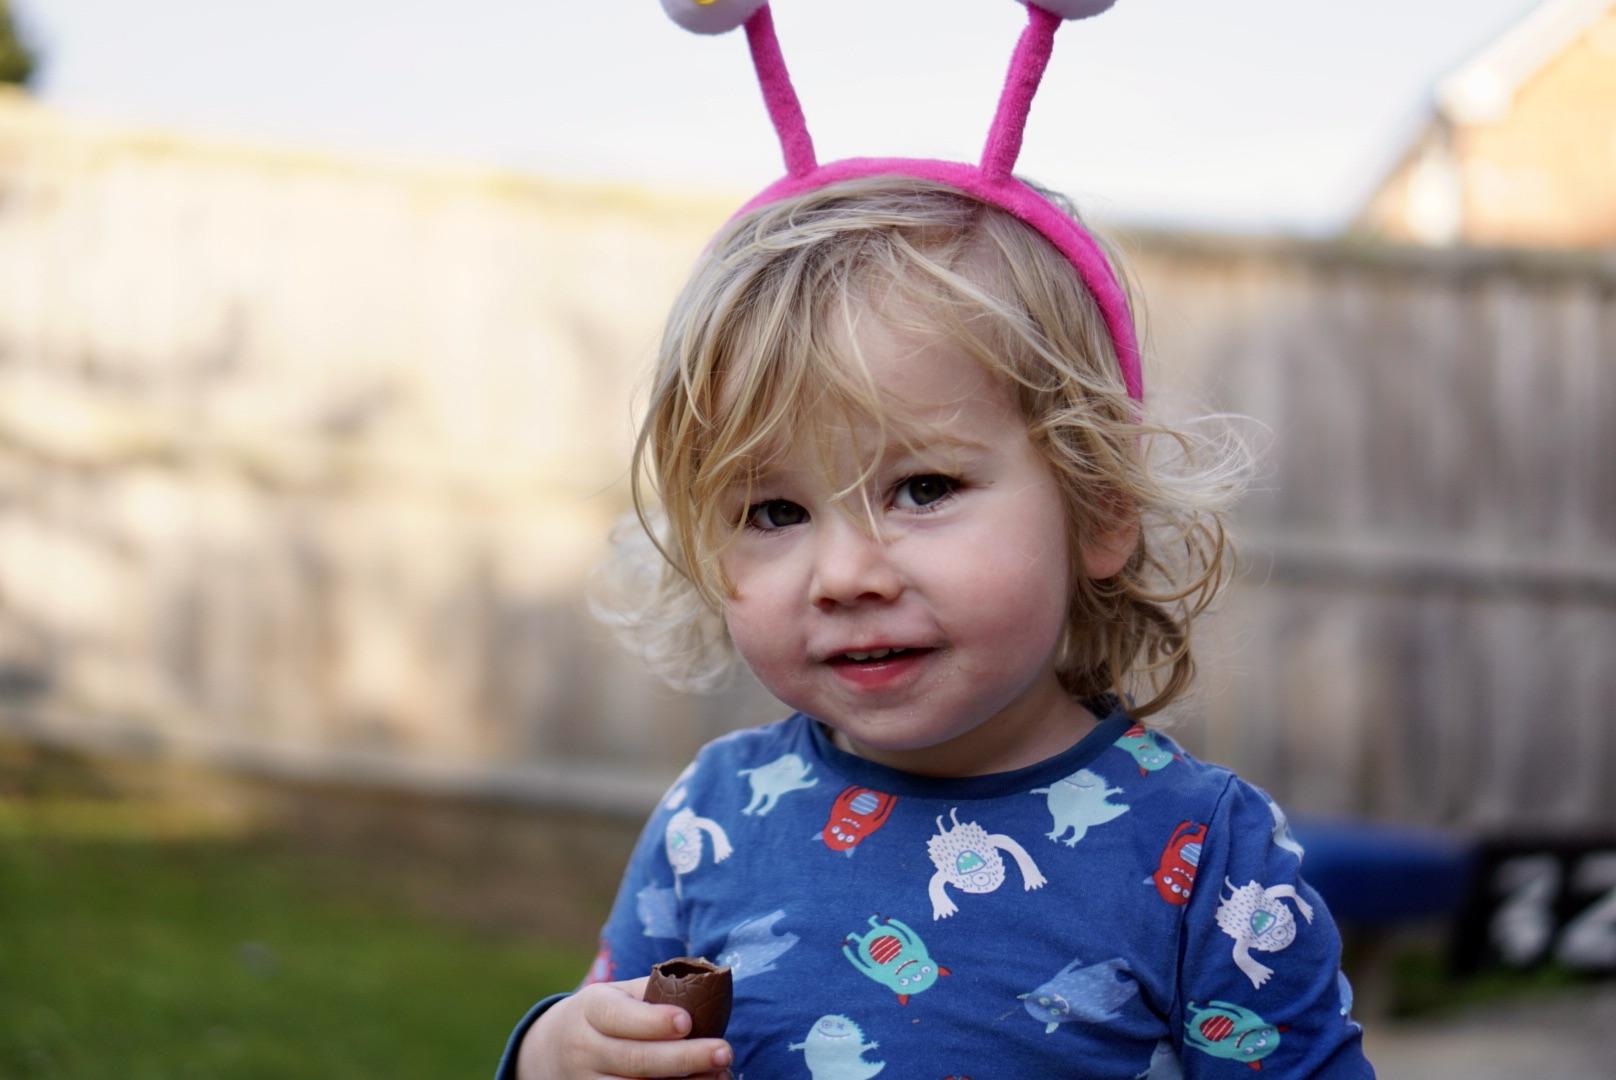 Easter egg bunny ears